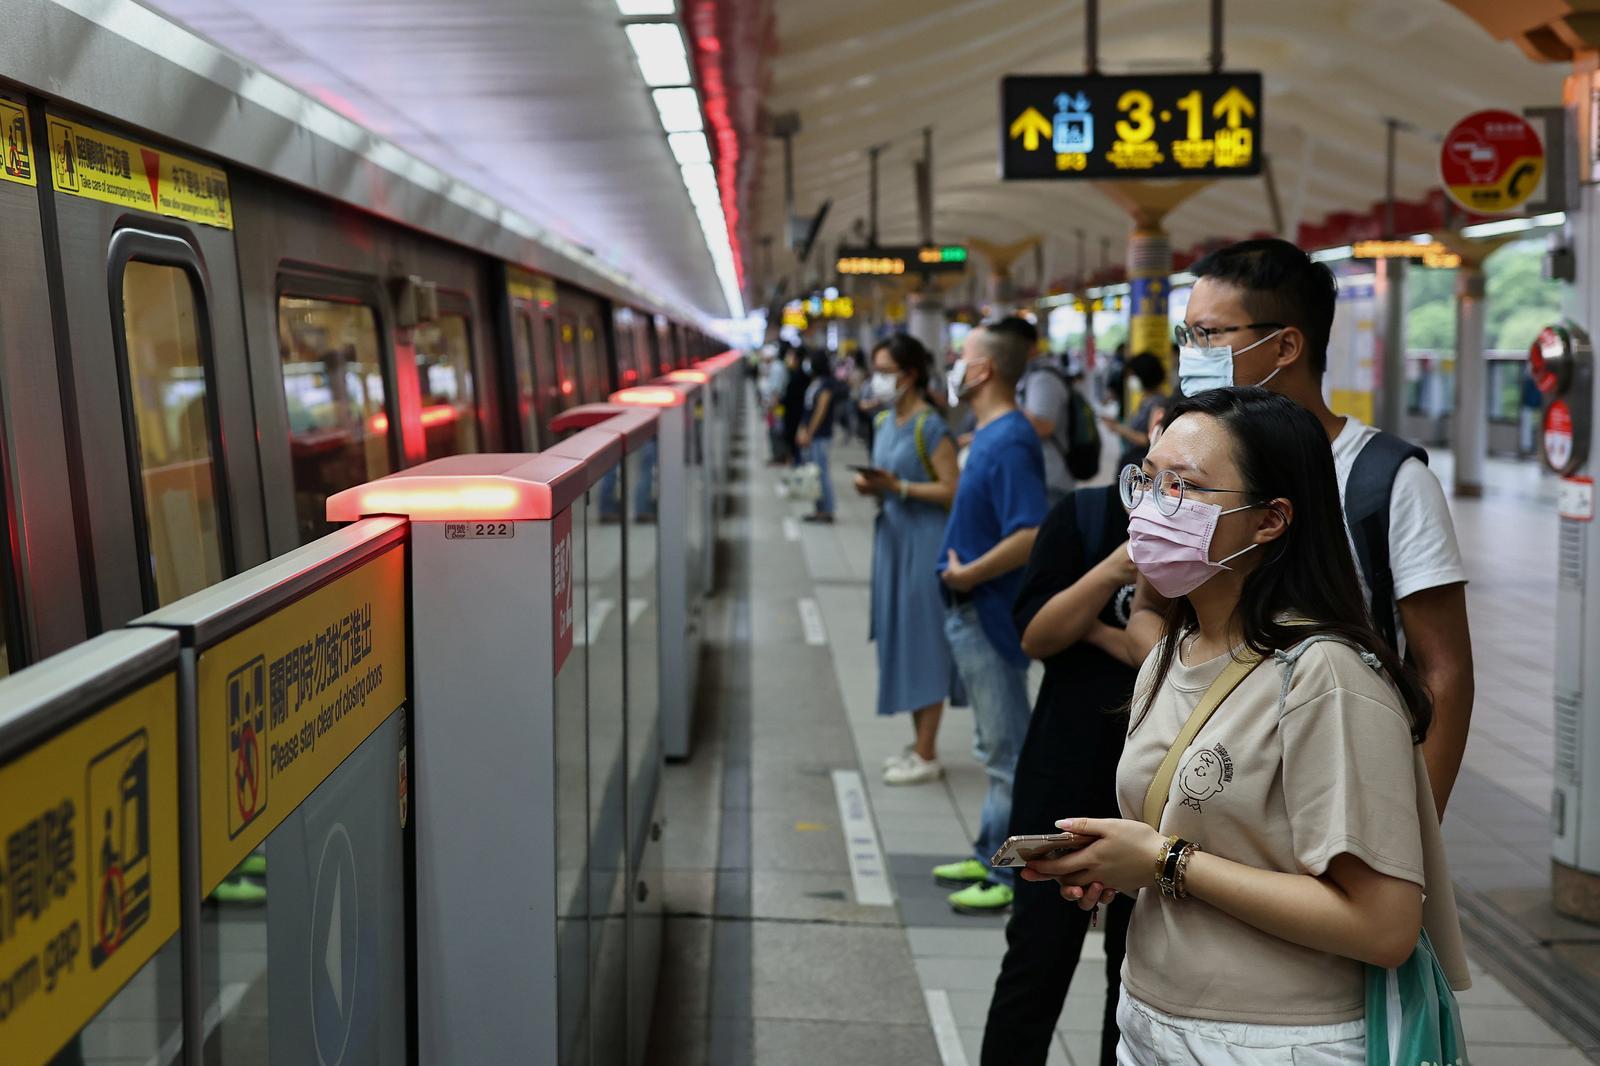 Taiwan warns on rising COVID-19 risk, stocks tank